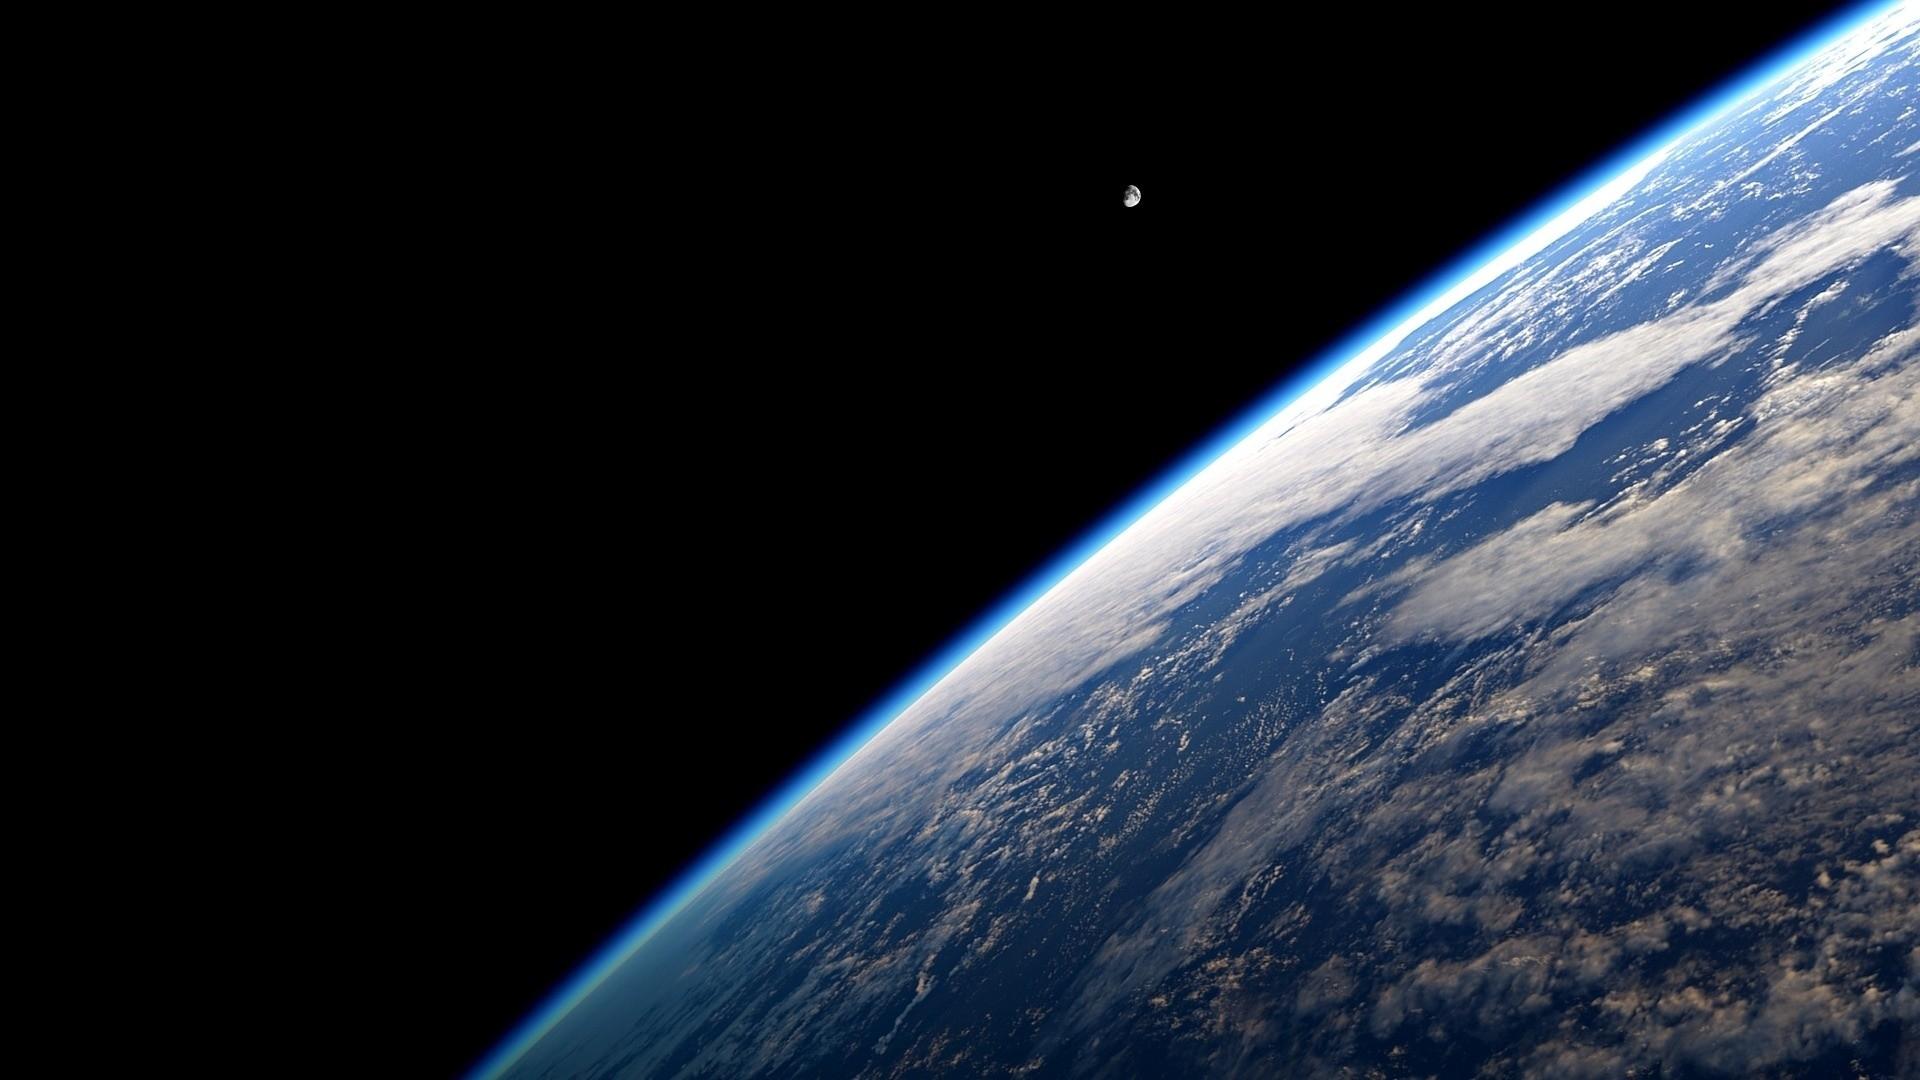 Earth Space Background   wallpaper, wallpaper hd, background desktop